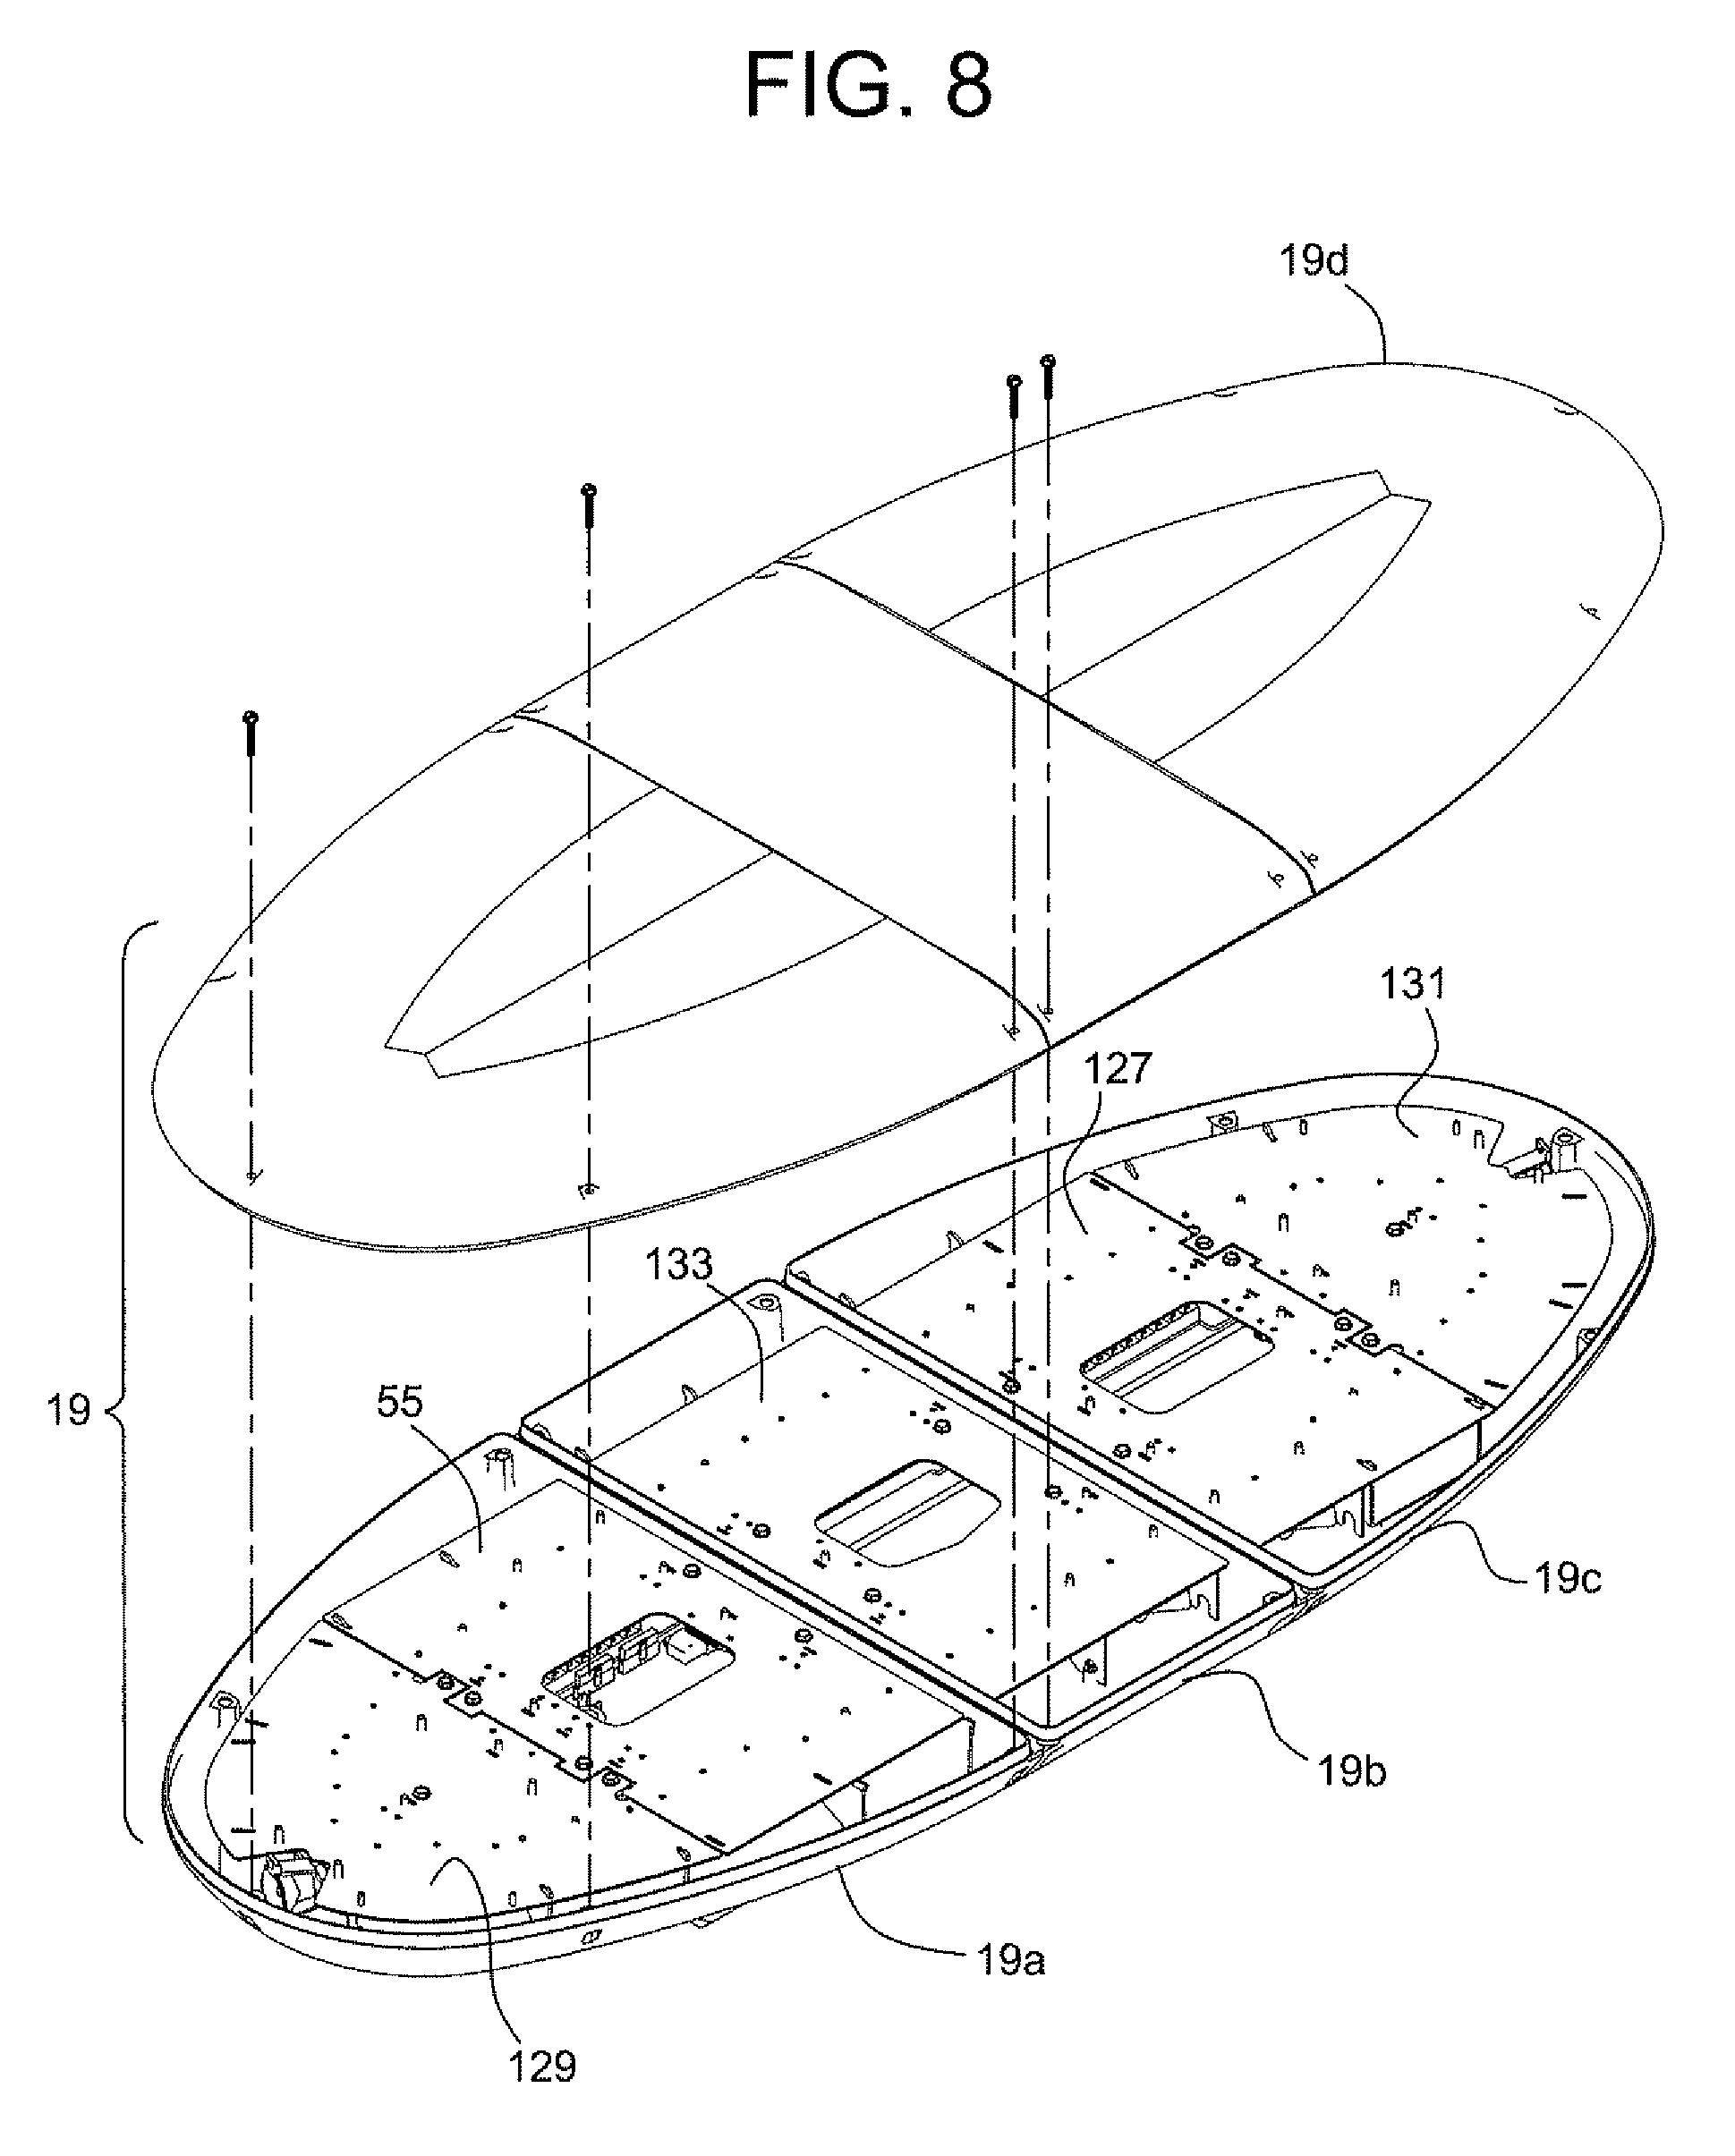 Jet Stream Light Bar Wiring Diagram : 35 Wiring Diagram